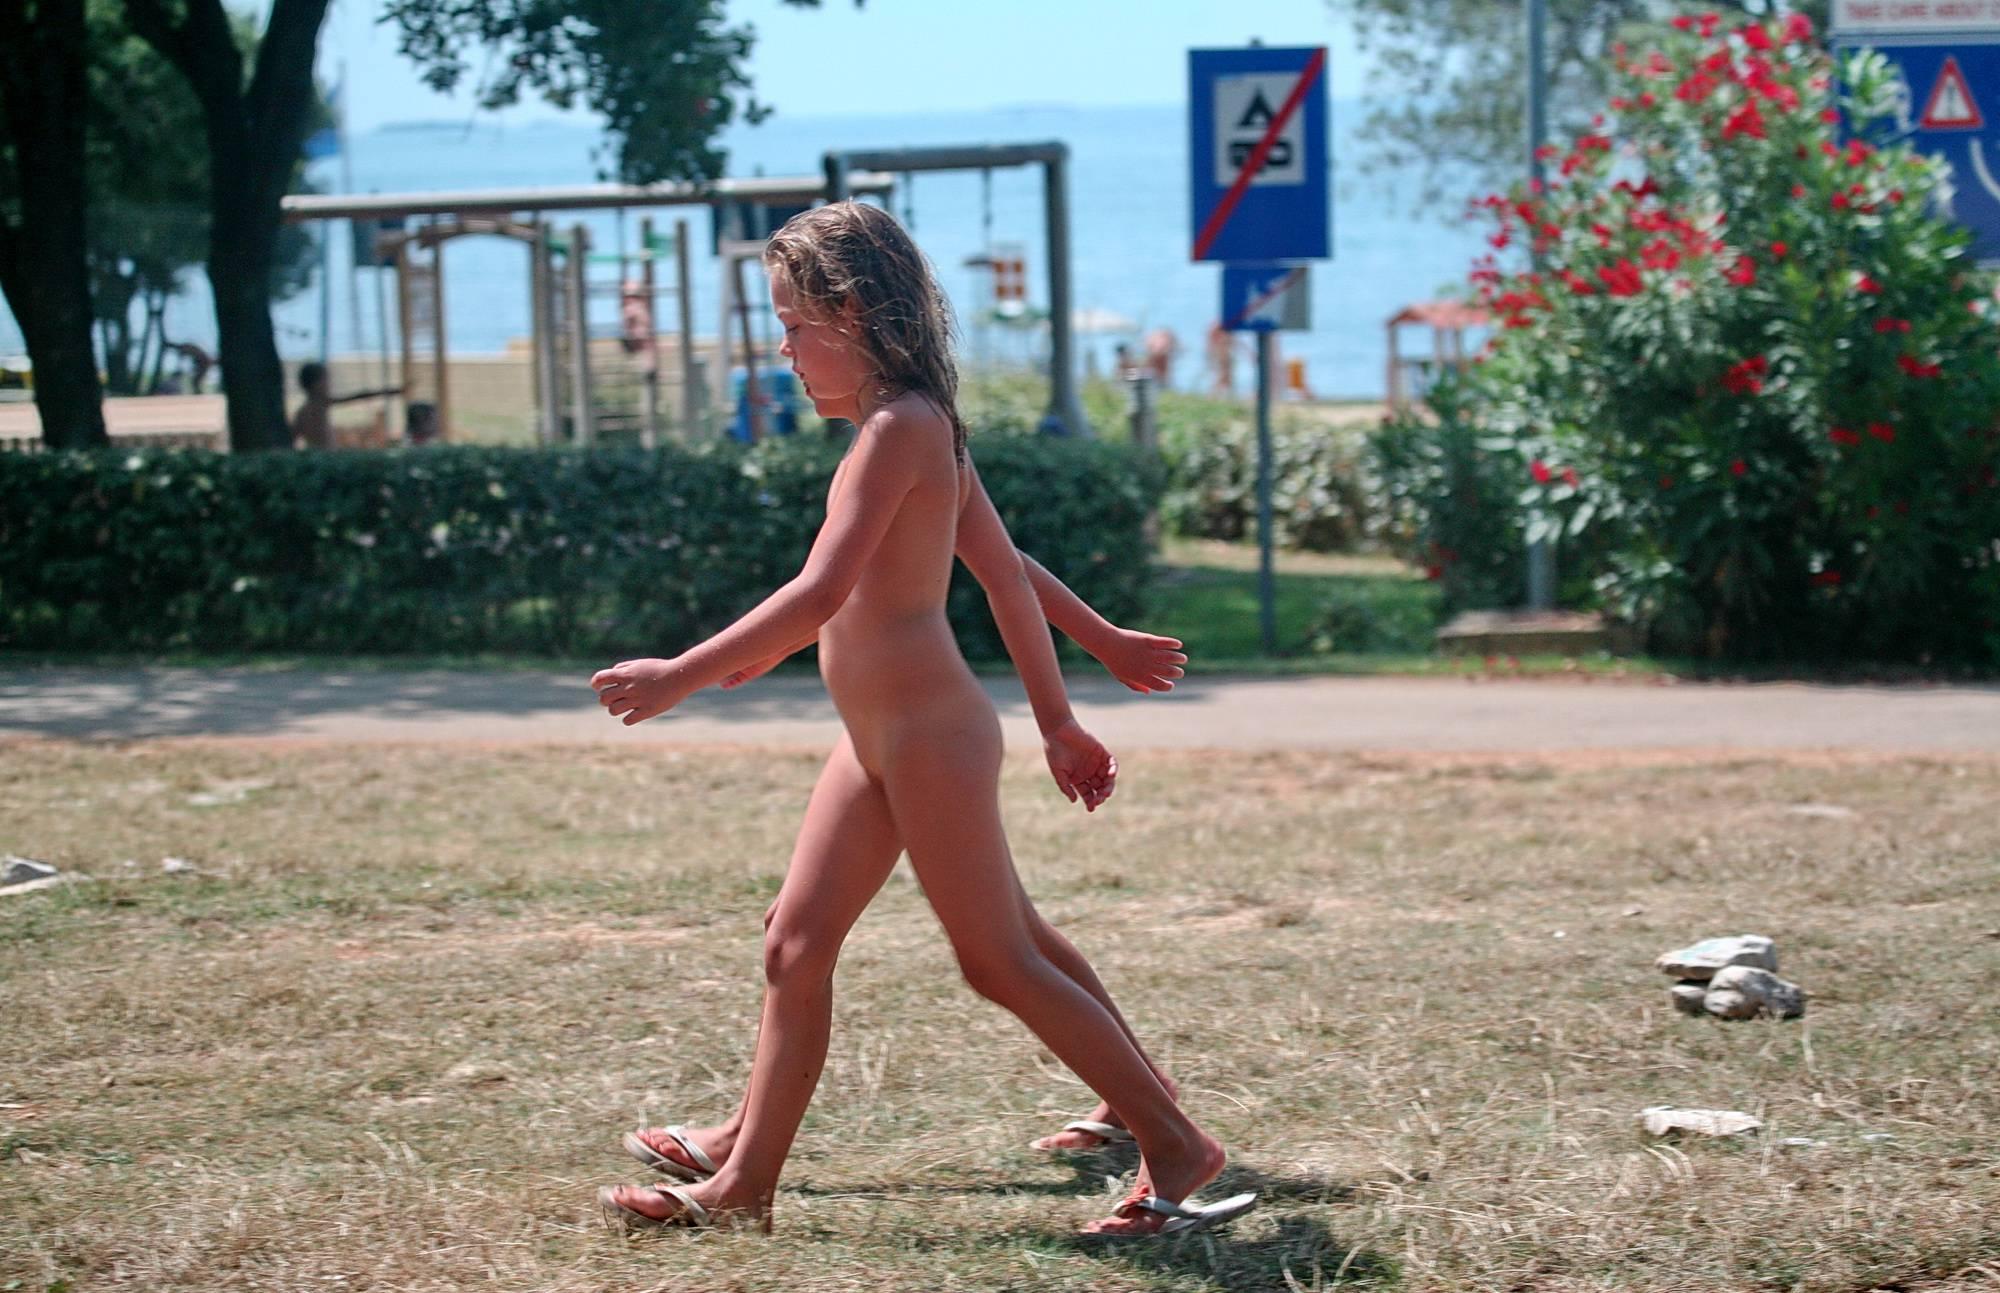 Purenudism Images-Naturist Caught in Walking - 2